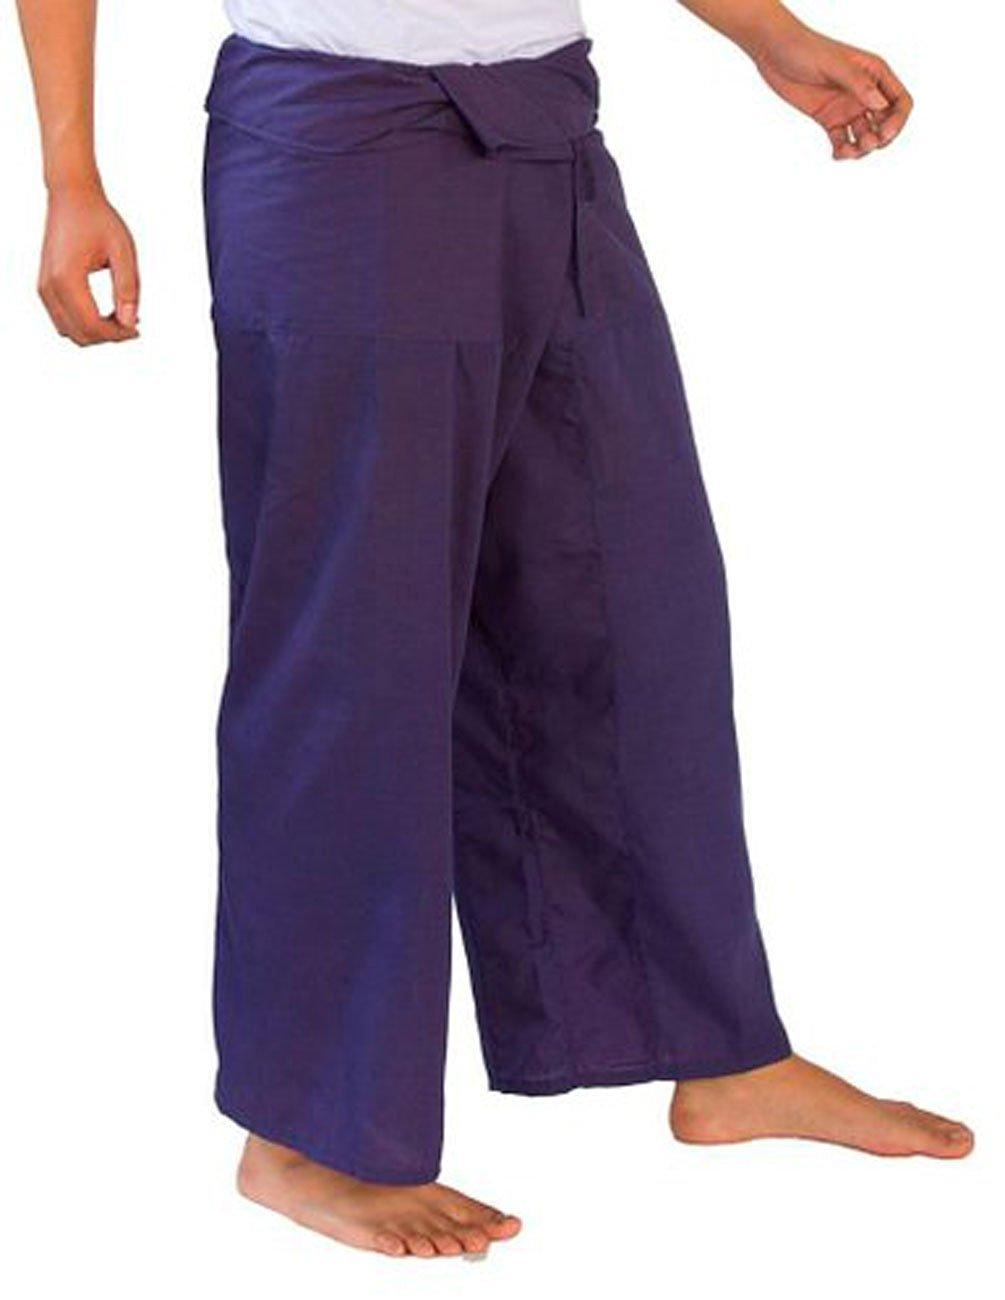 THAI MASSAGE PANTS THI FISHERMAN PANTS YOGA SUMMER BEACH PANTS FINE COTTON